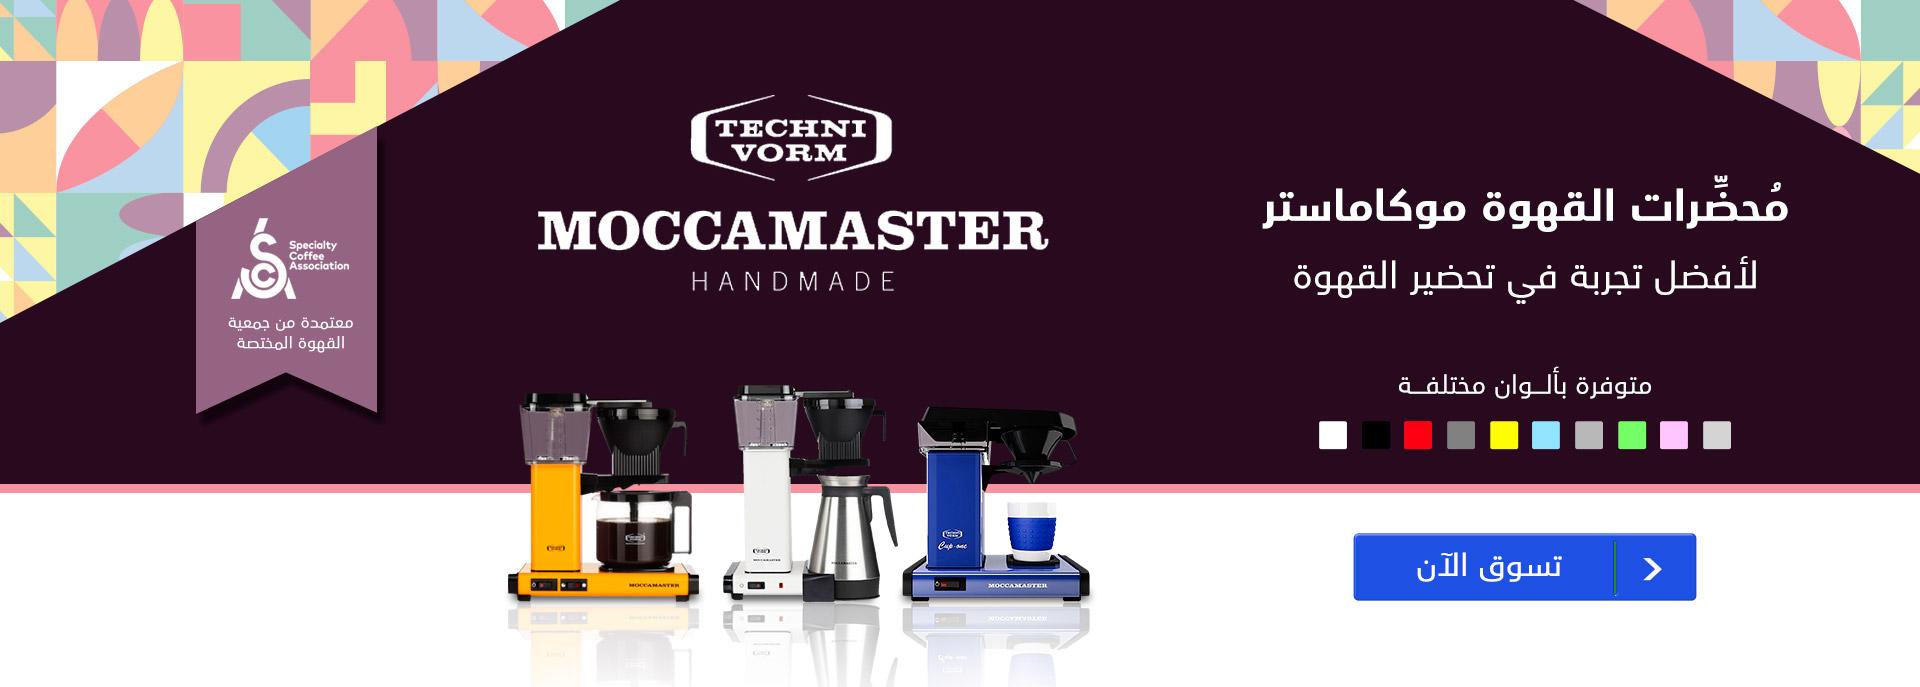 mocccamaster